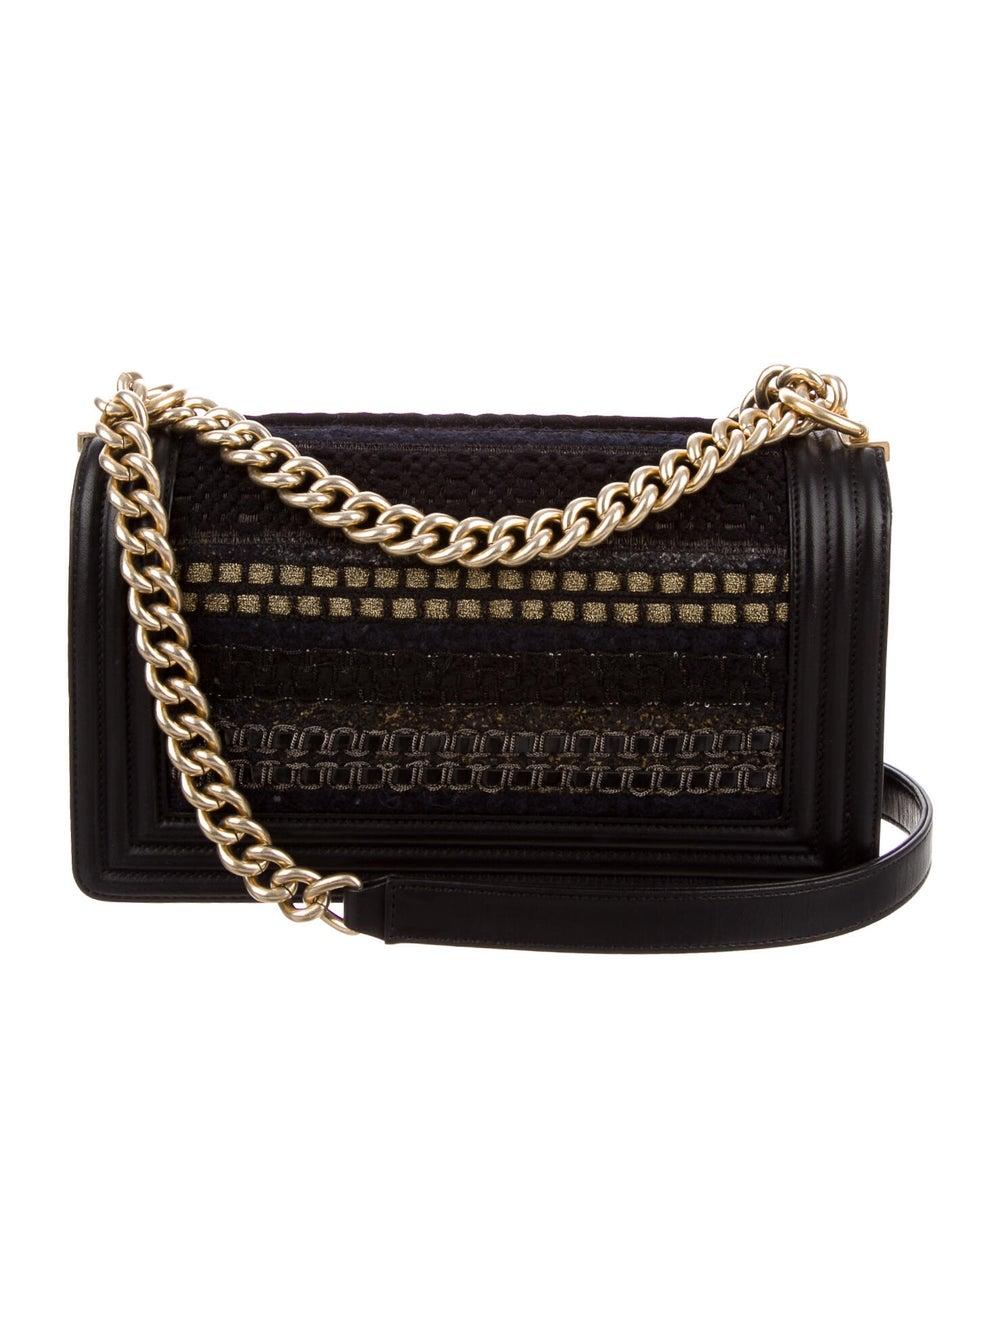 Chanel Medium Tweed Boy Bag Black - image 4